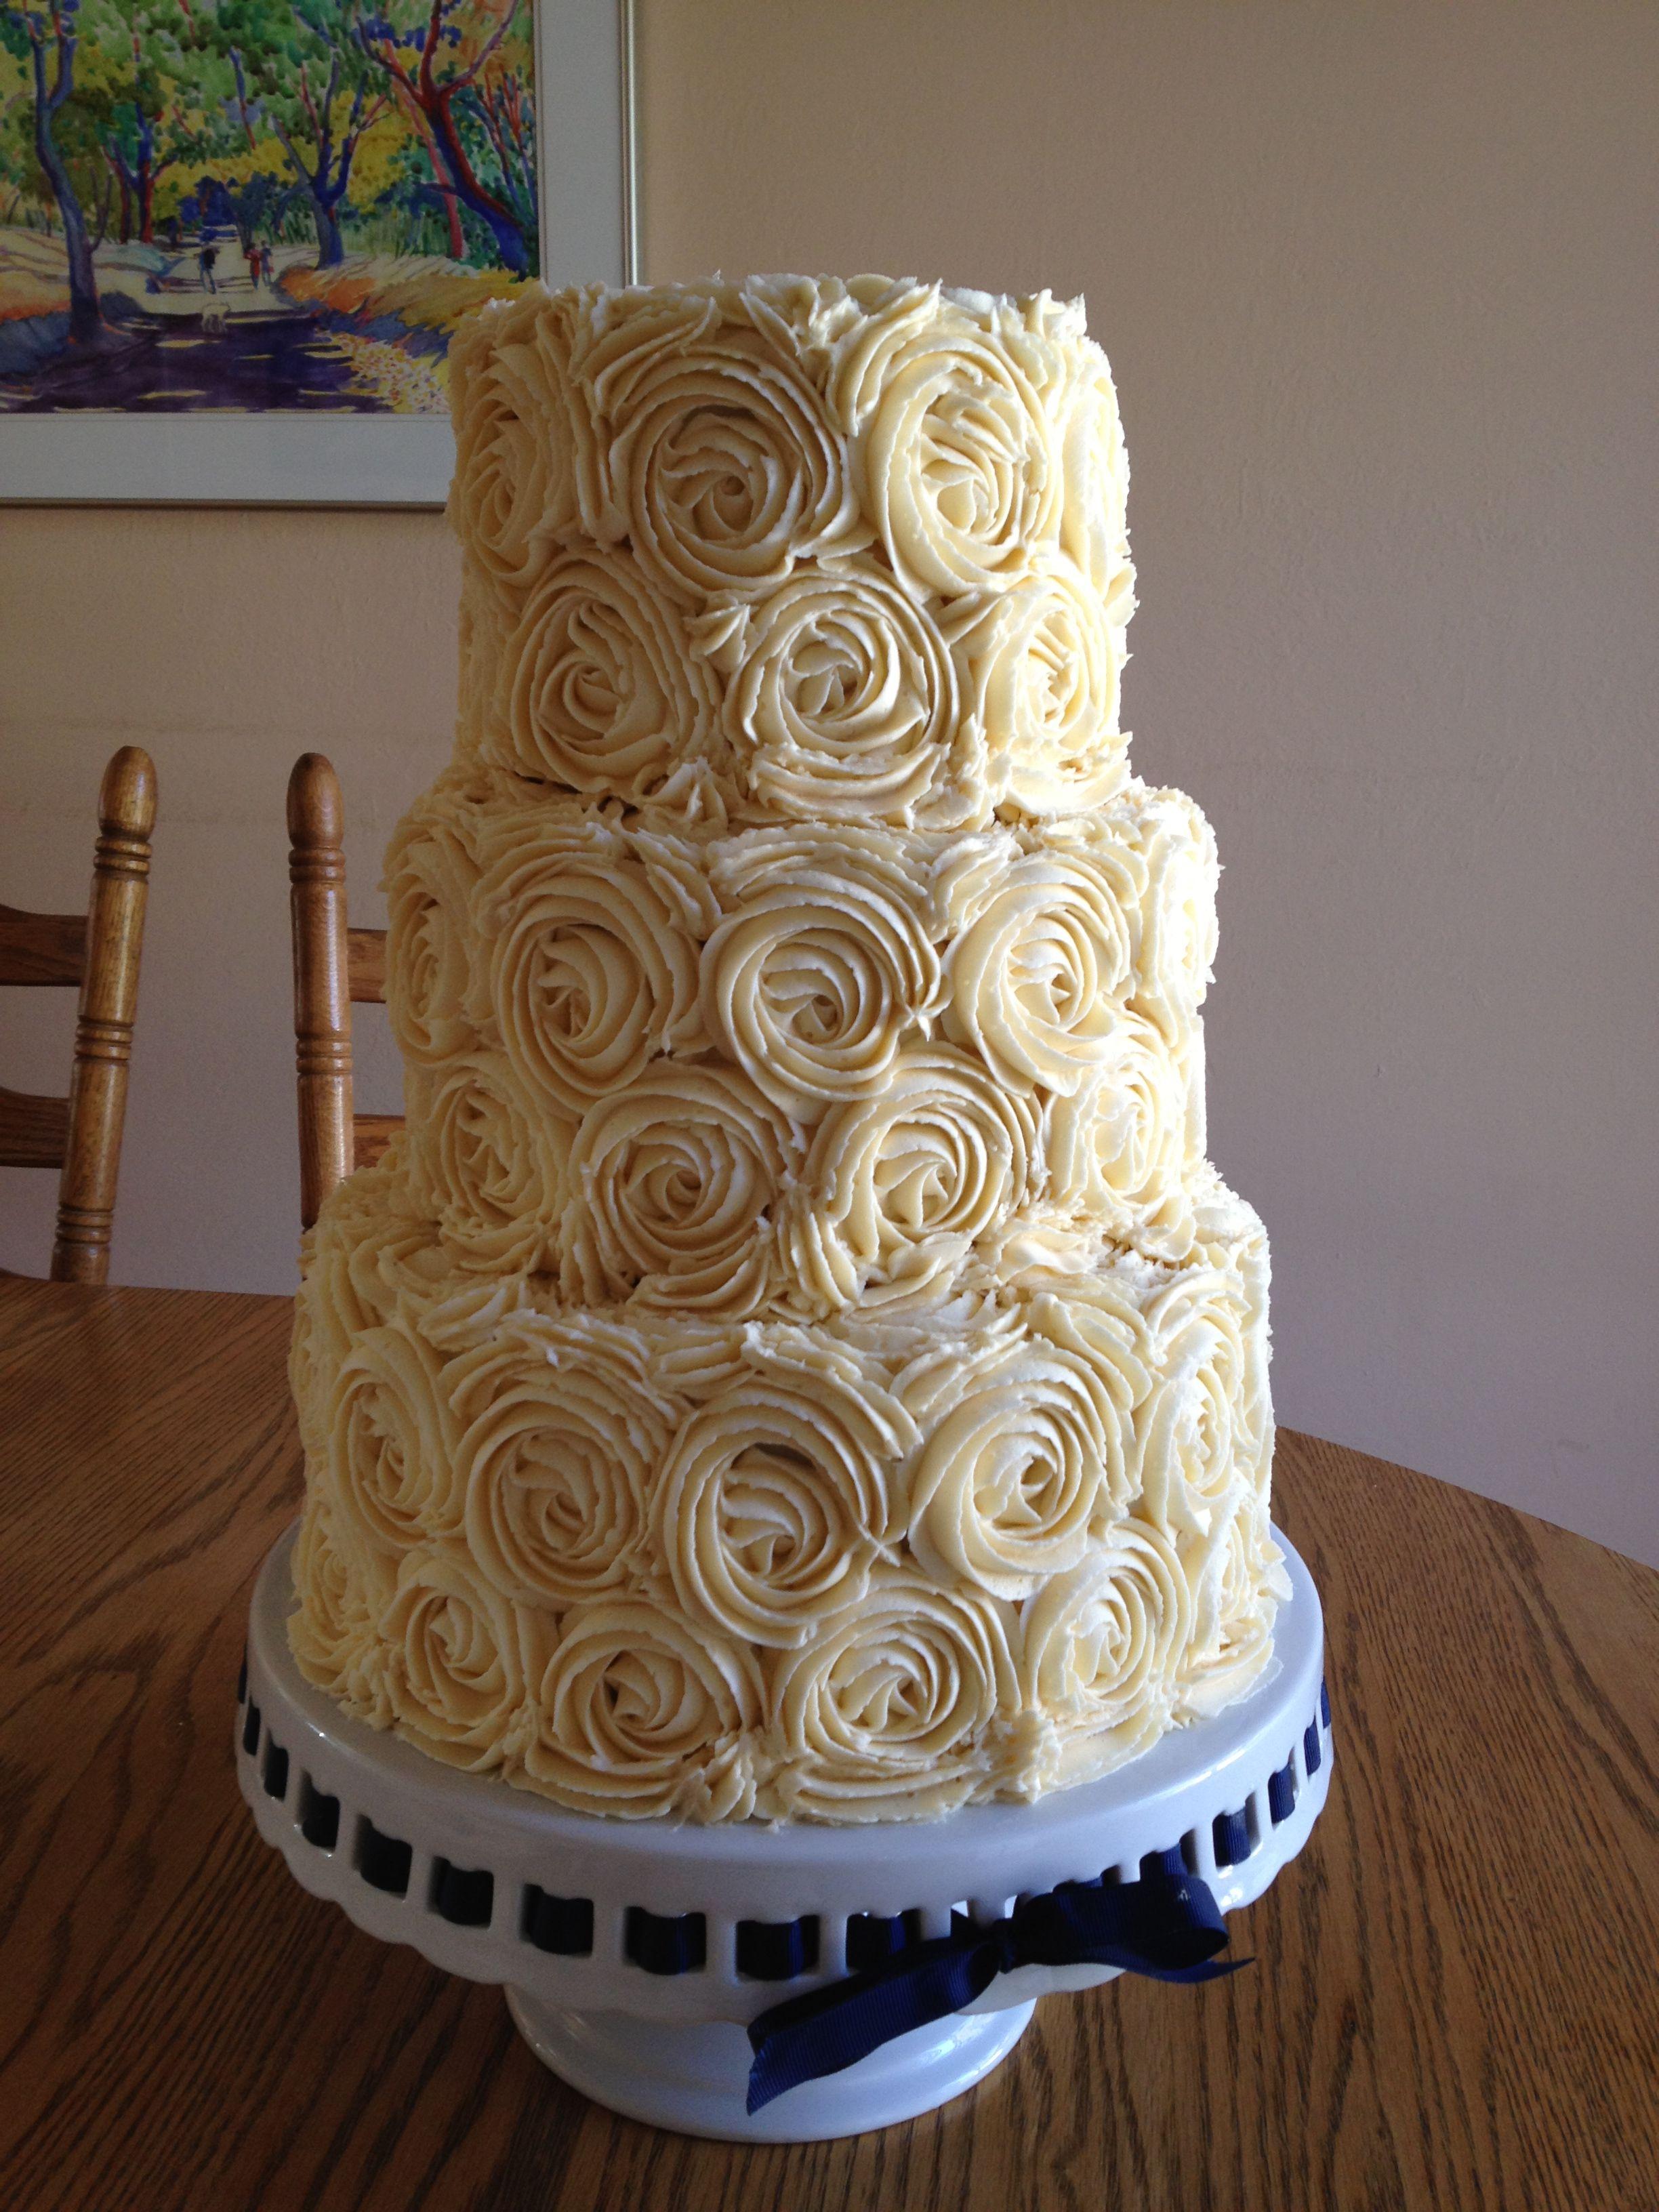 wedding cakes in lagunbeach ca%0A Ivory rosette buttercream wedding cake